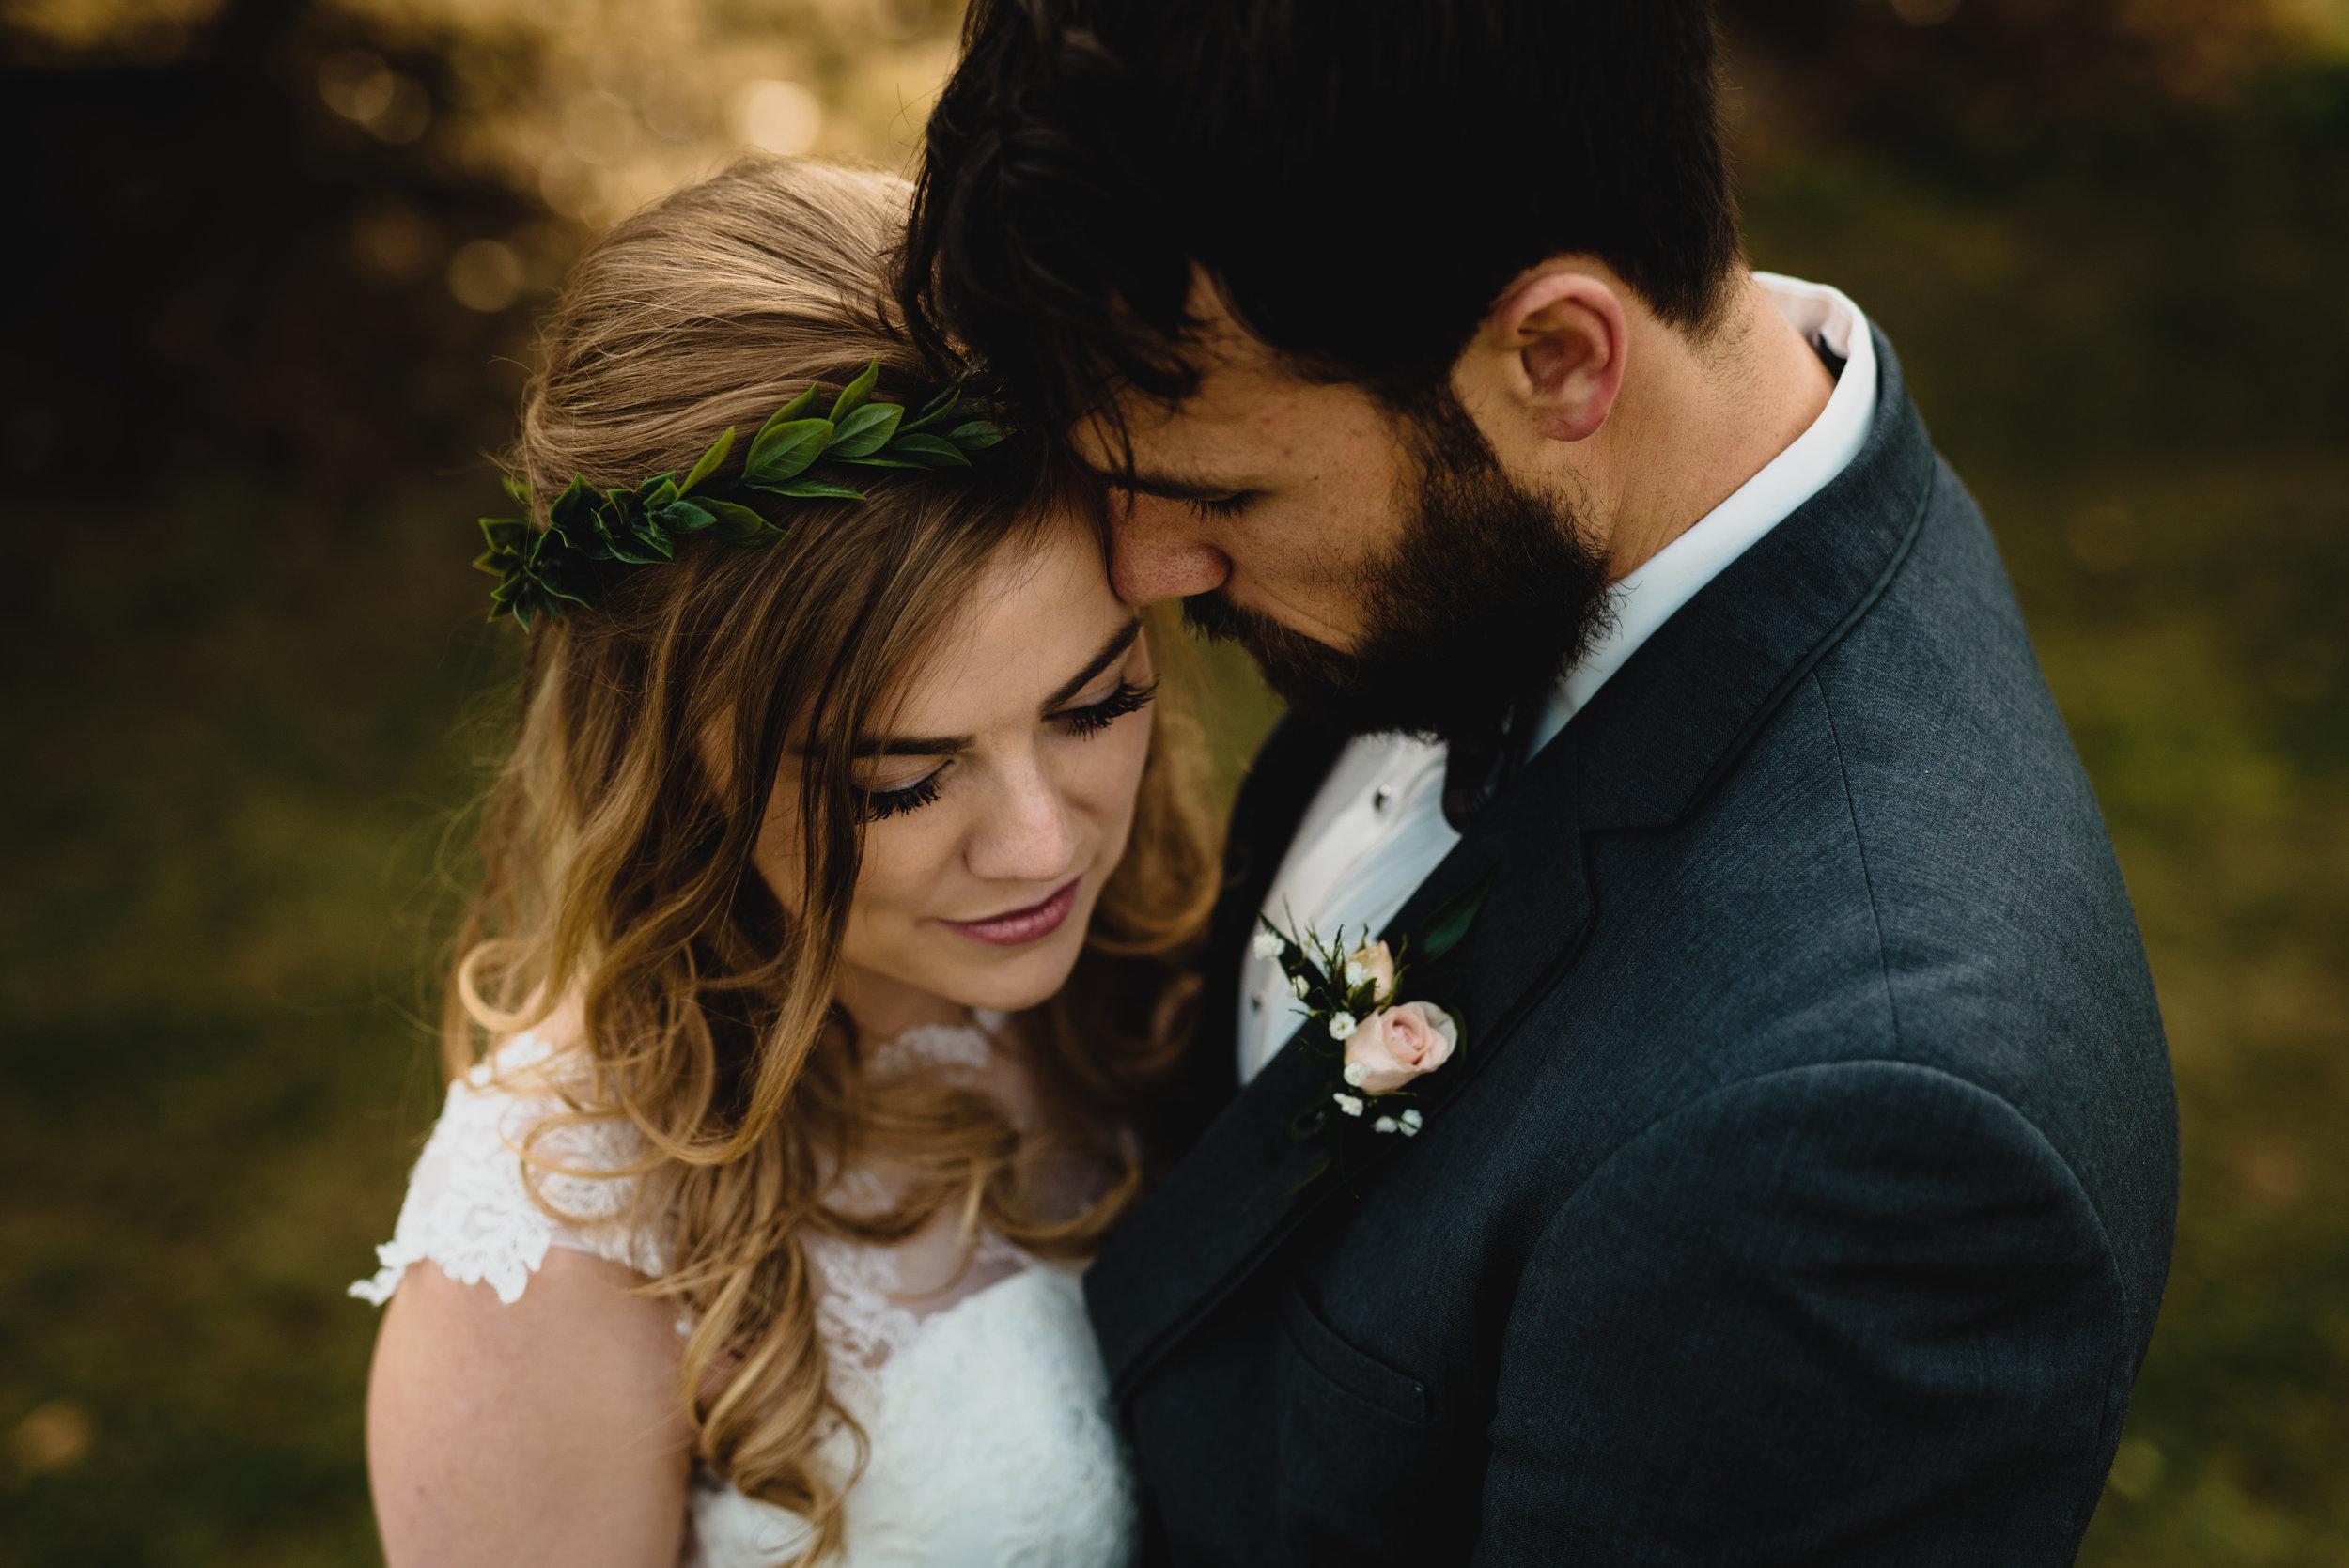 Wedding-Brooke-Adam-2star-035.jpg